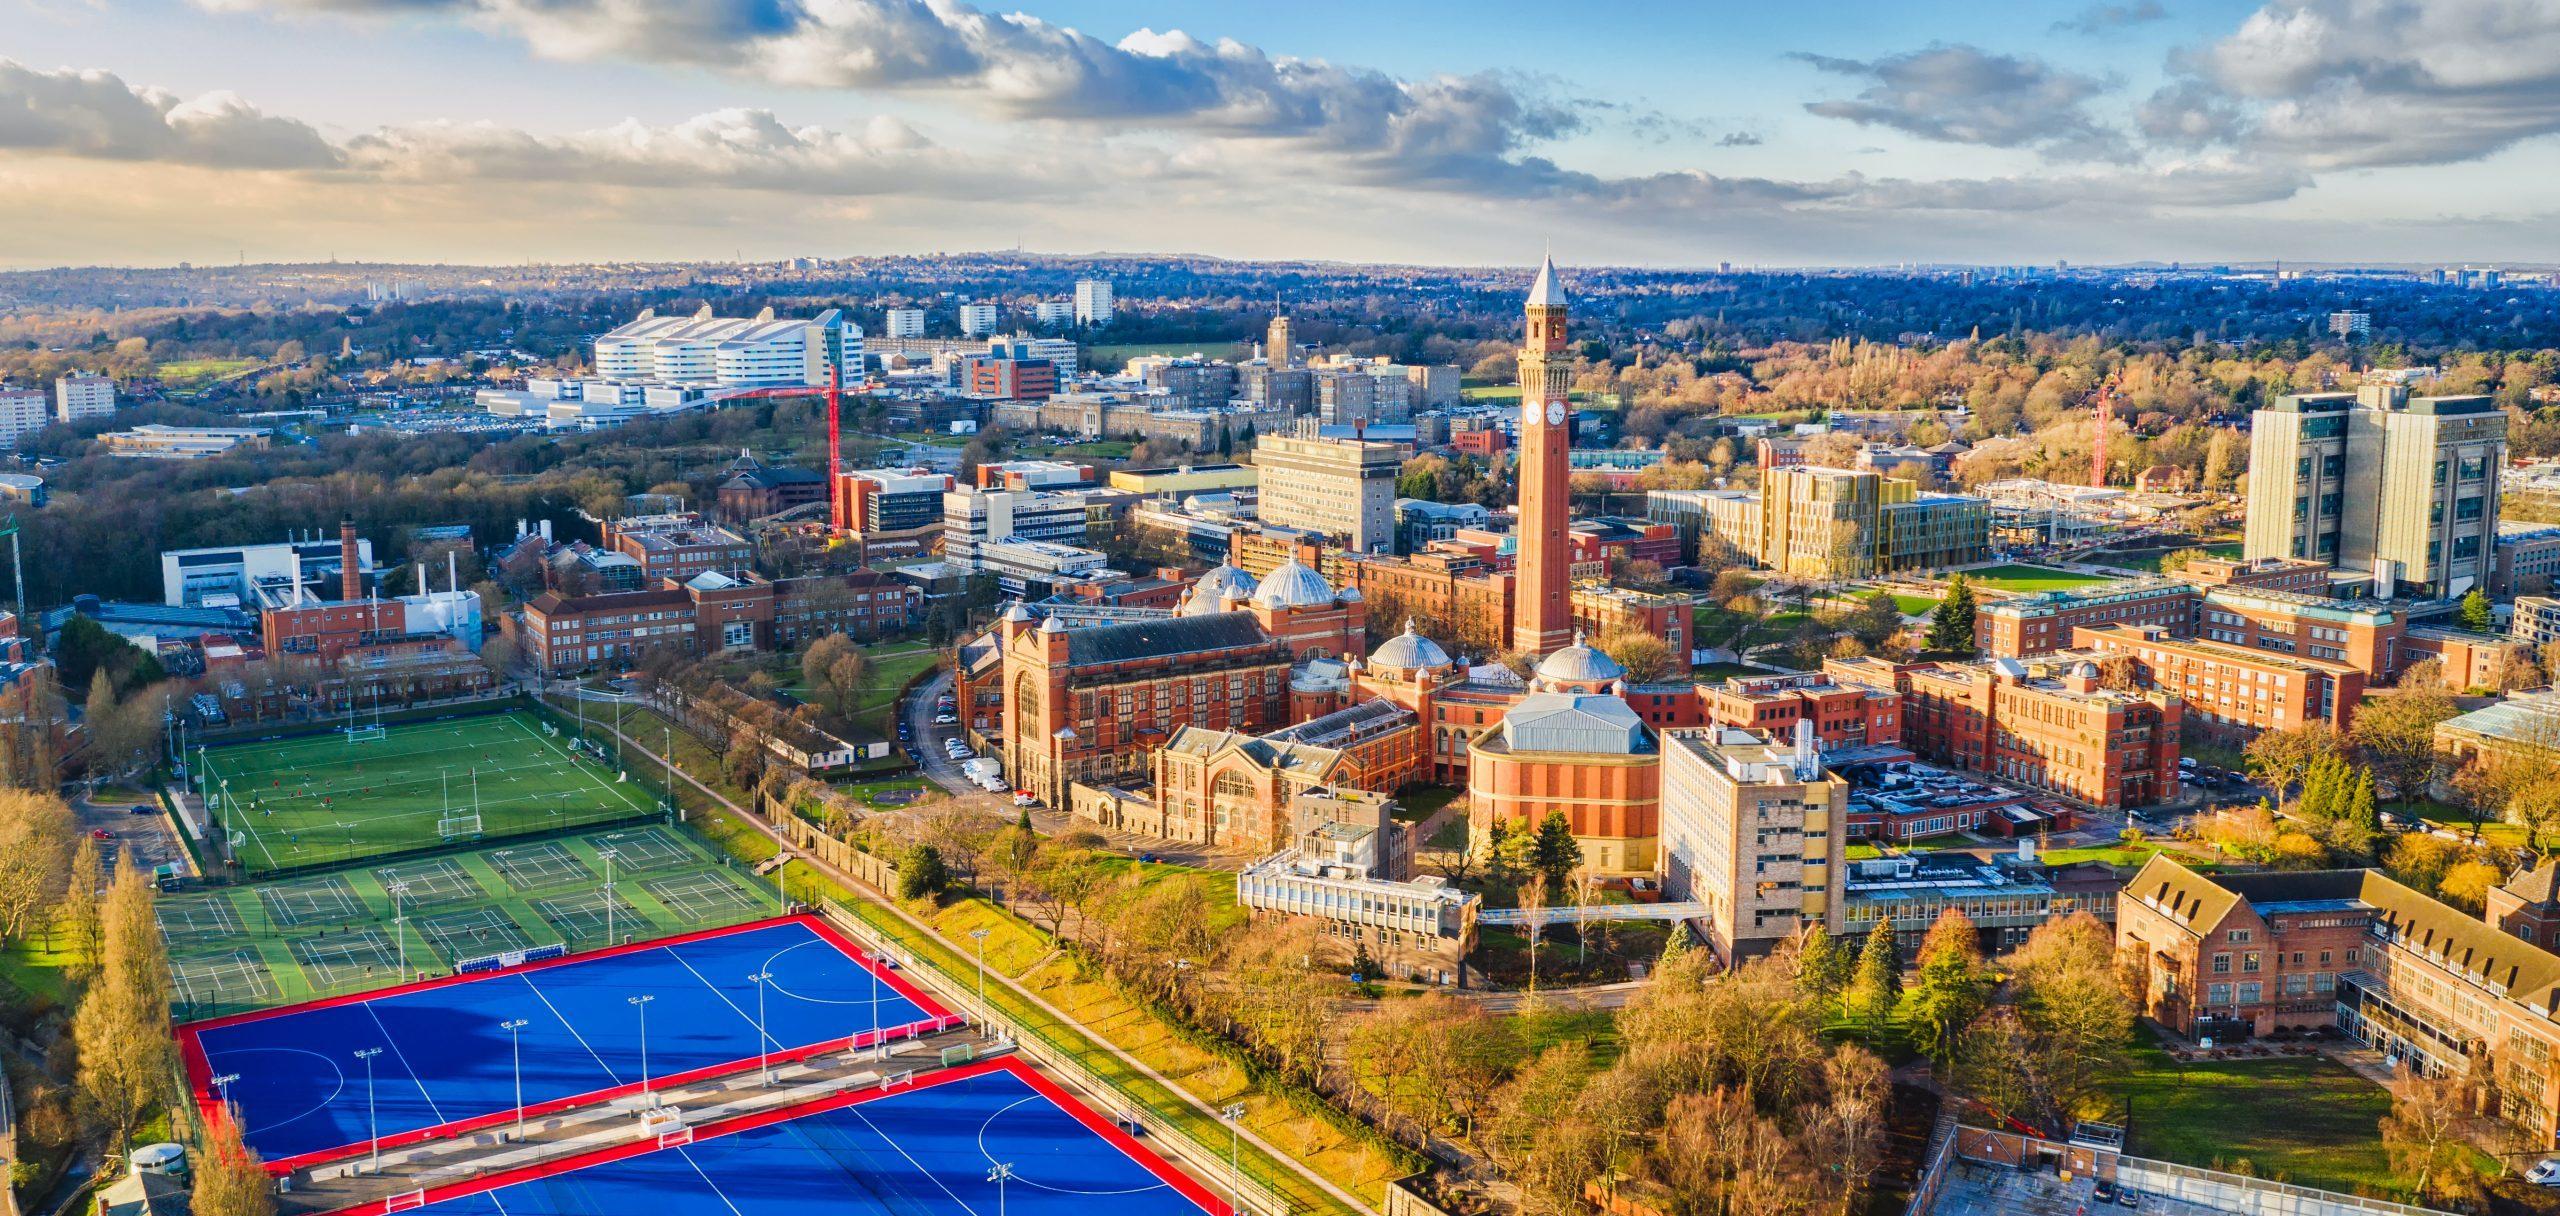 University of Birmingham Case Study